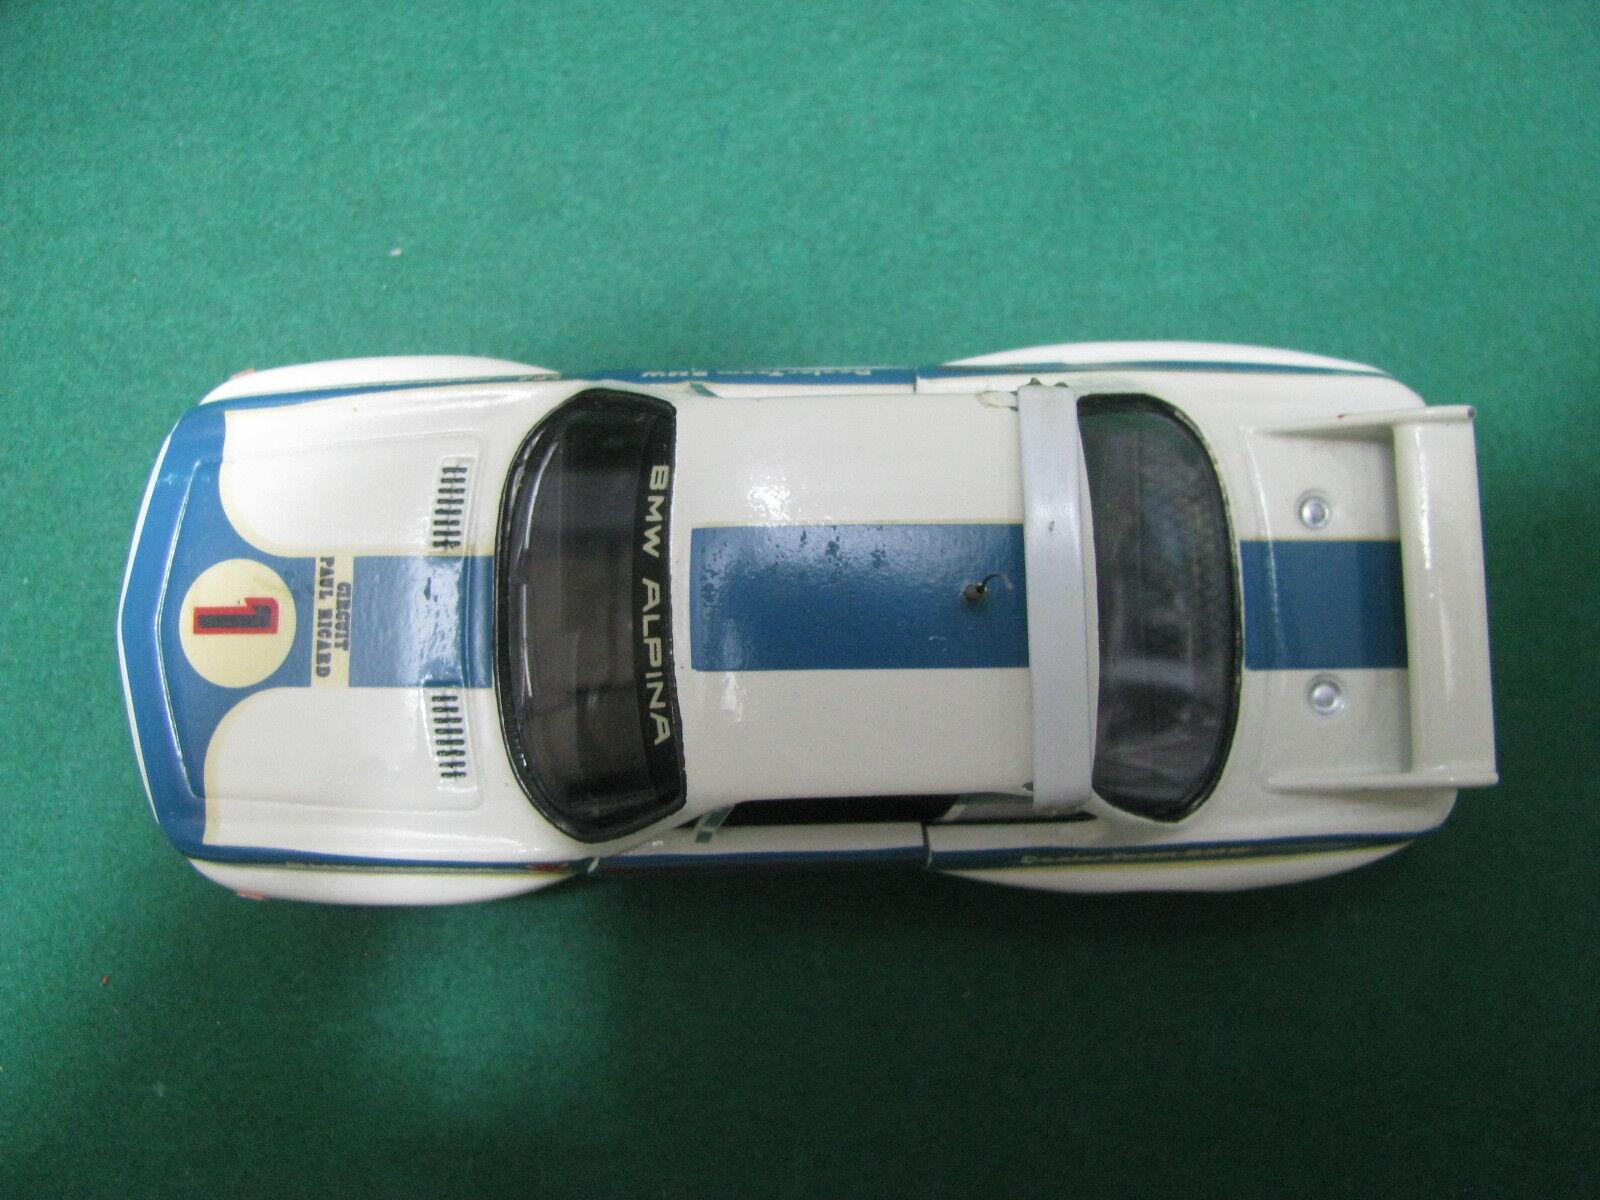 Vintage - - - BMW 3000 CLS Team bmw Alpina - 1 43 Processing Solido 1974 37f761